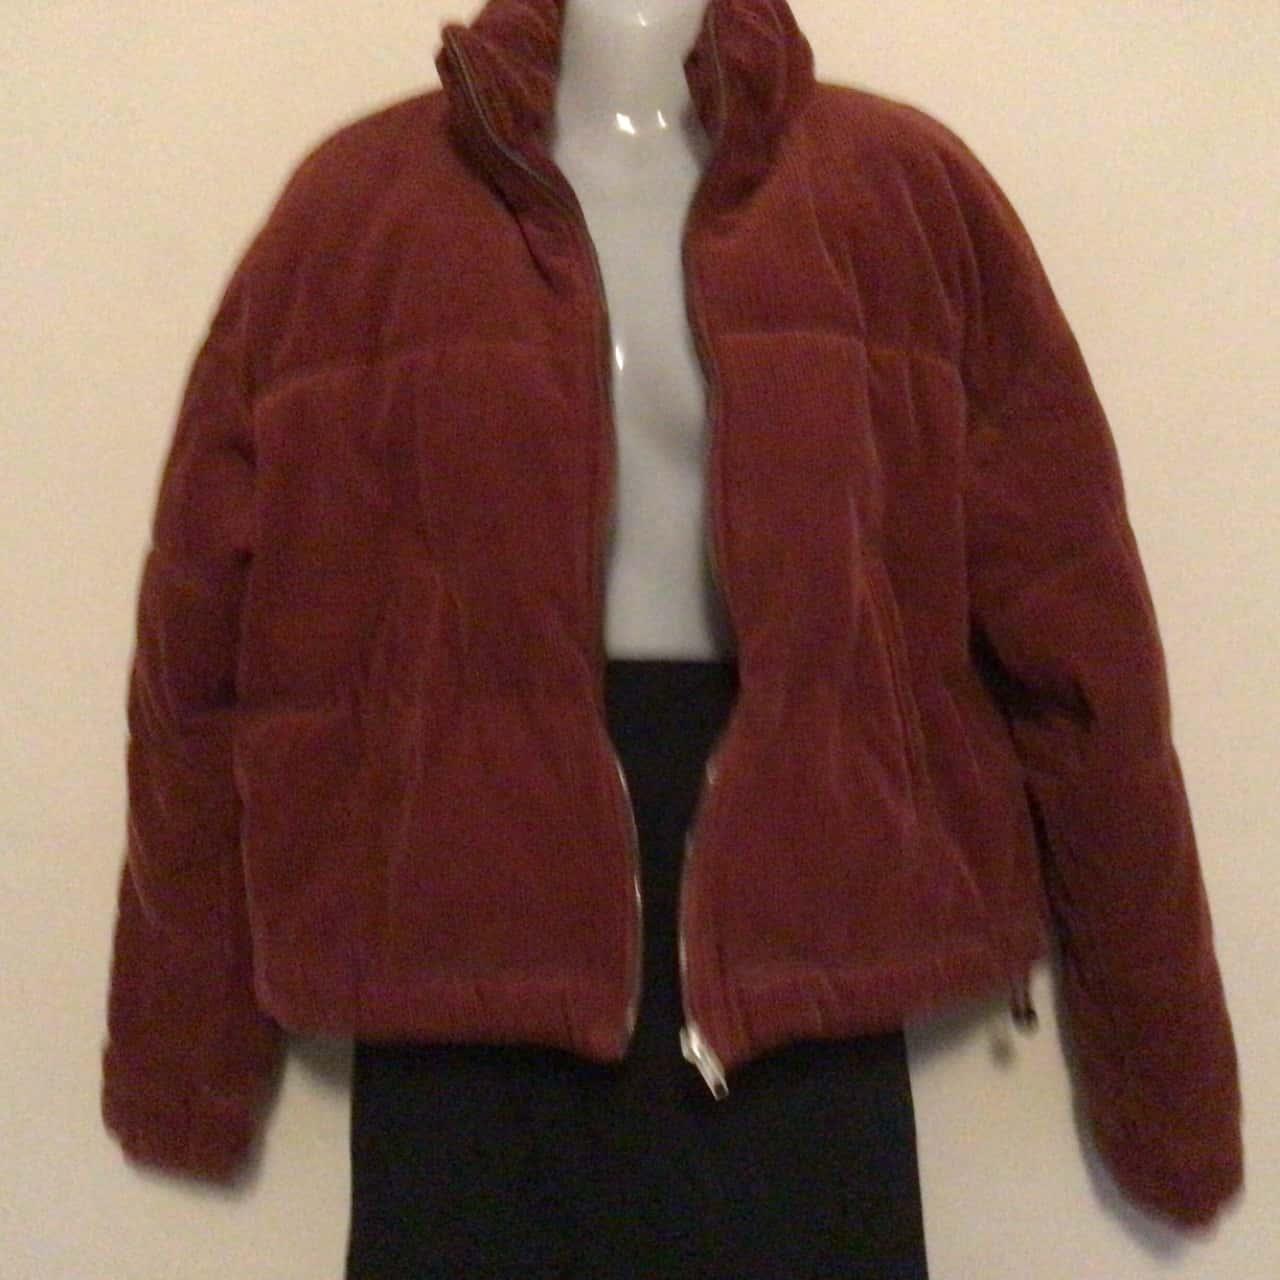 Womens Sportsgirl Thick Warm Corduroy Bomber Jacket Maroon Size 8